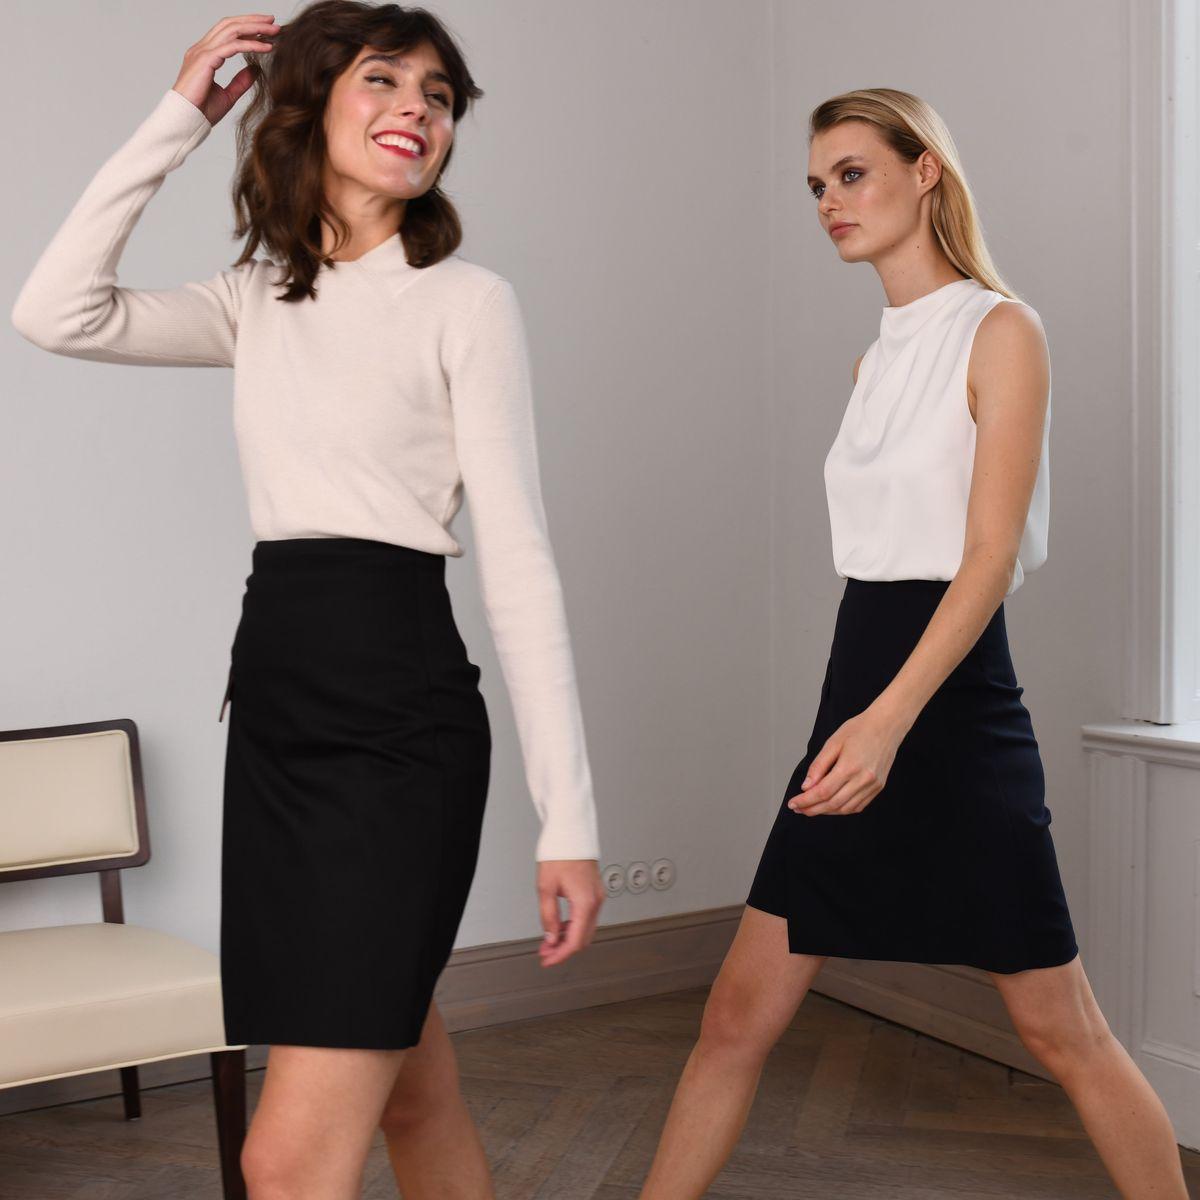 Si Beau: The Arendt Tutrle, The Mary Skirt